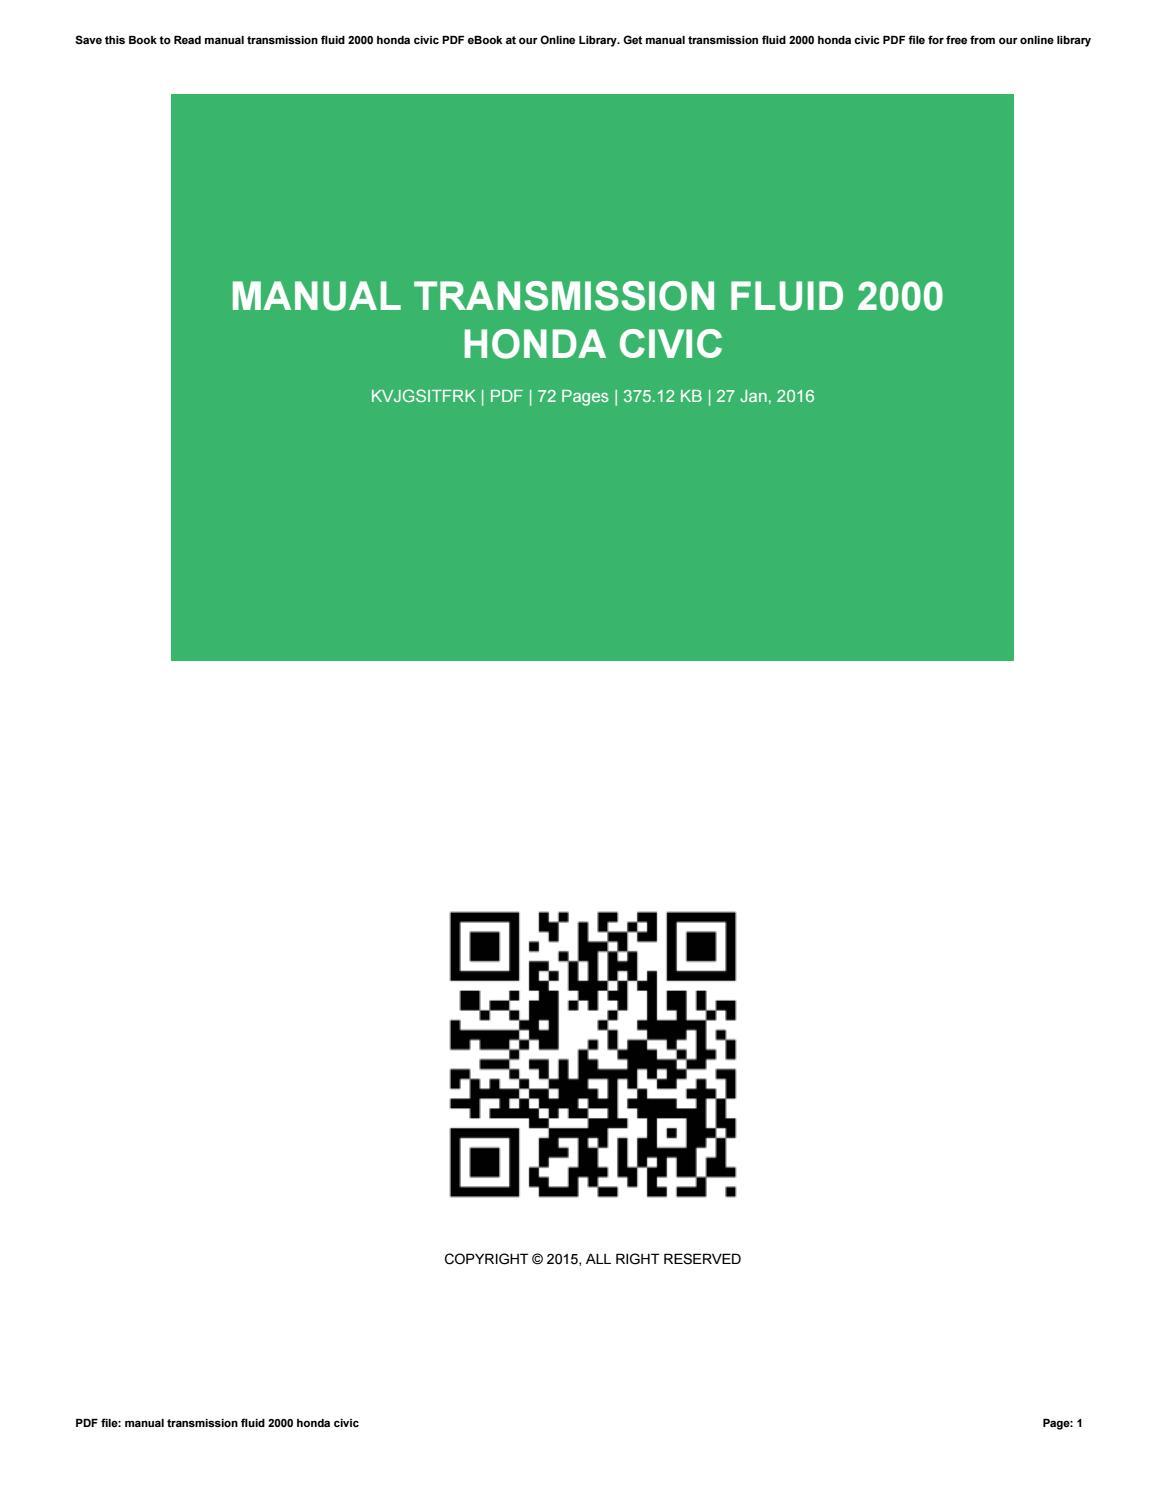 Manual transmission fluid 2000 honda civic by KristopherAhlstrom2093 - issuu